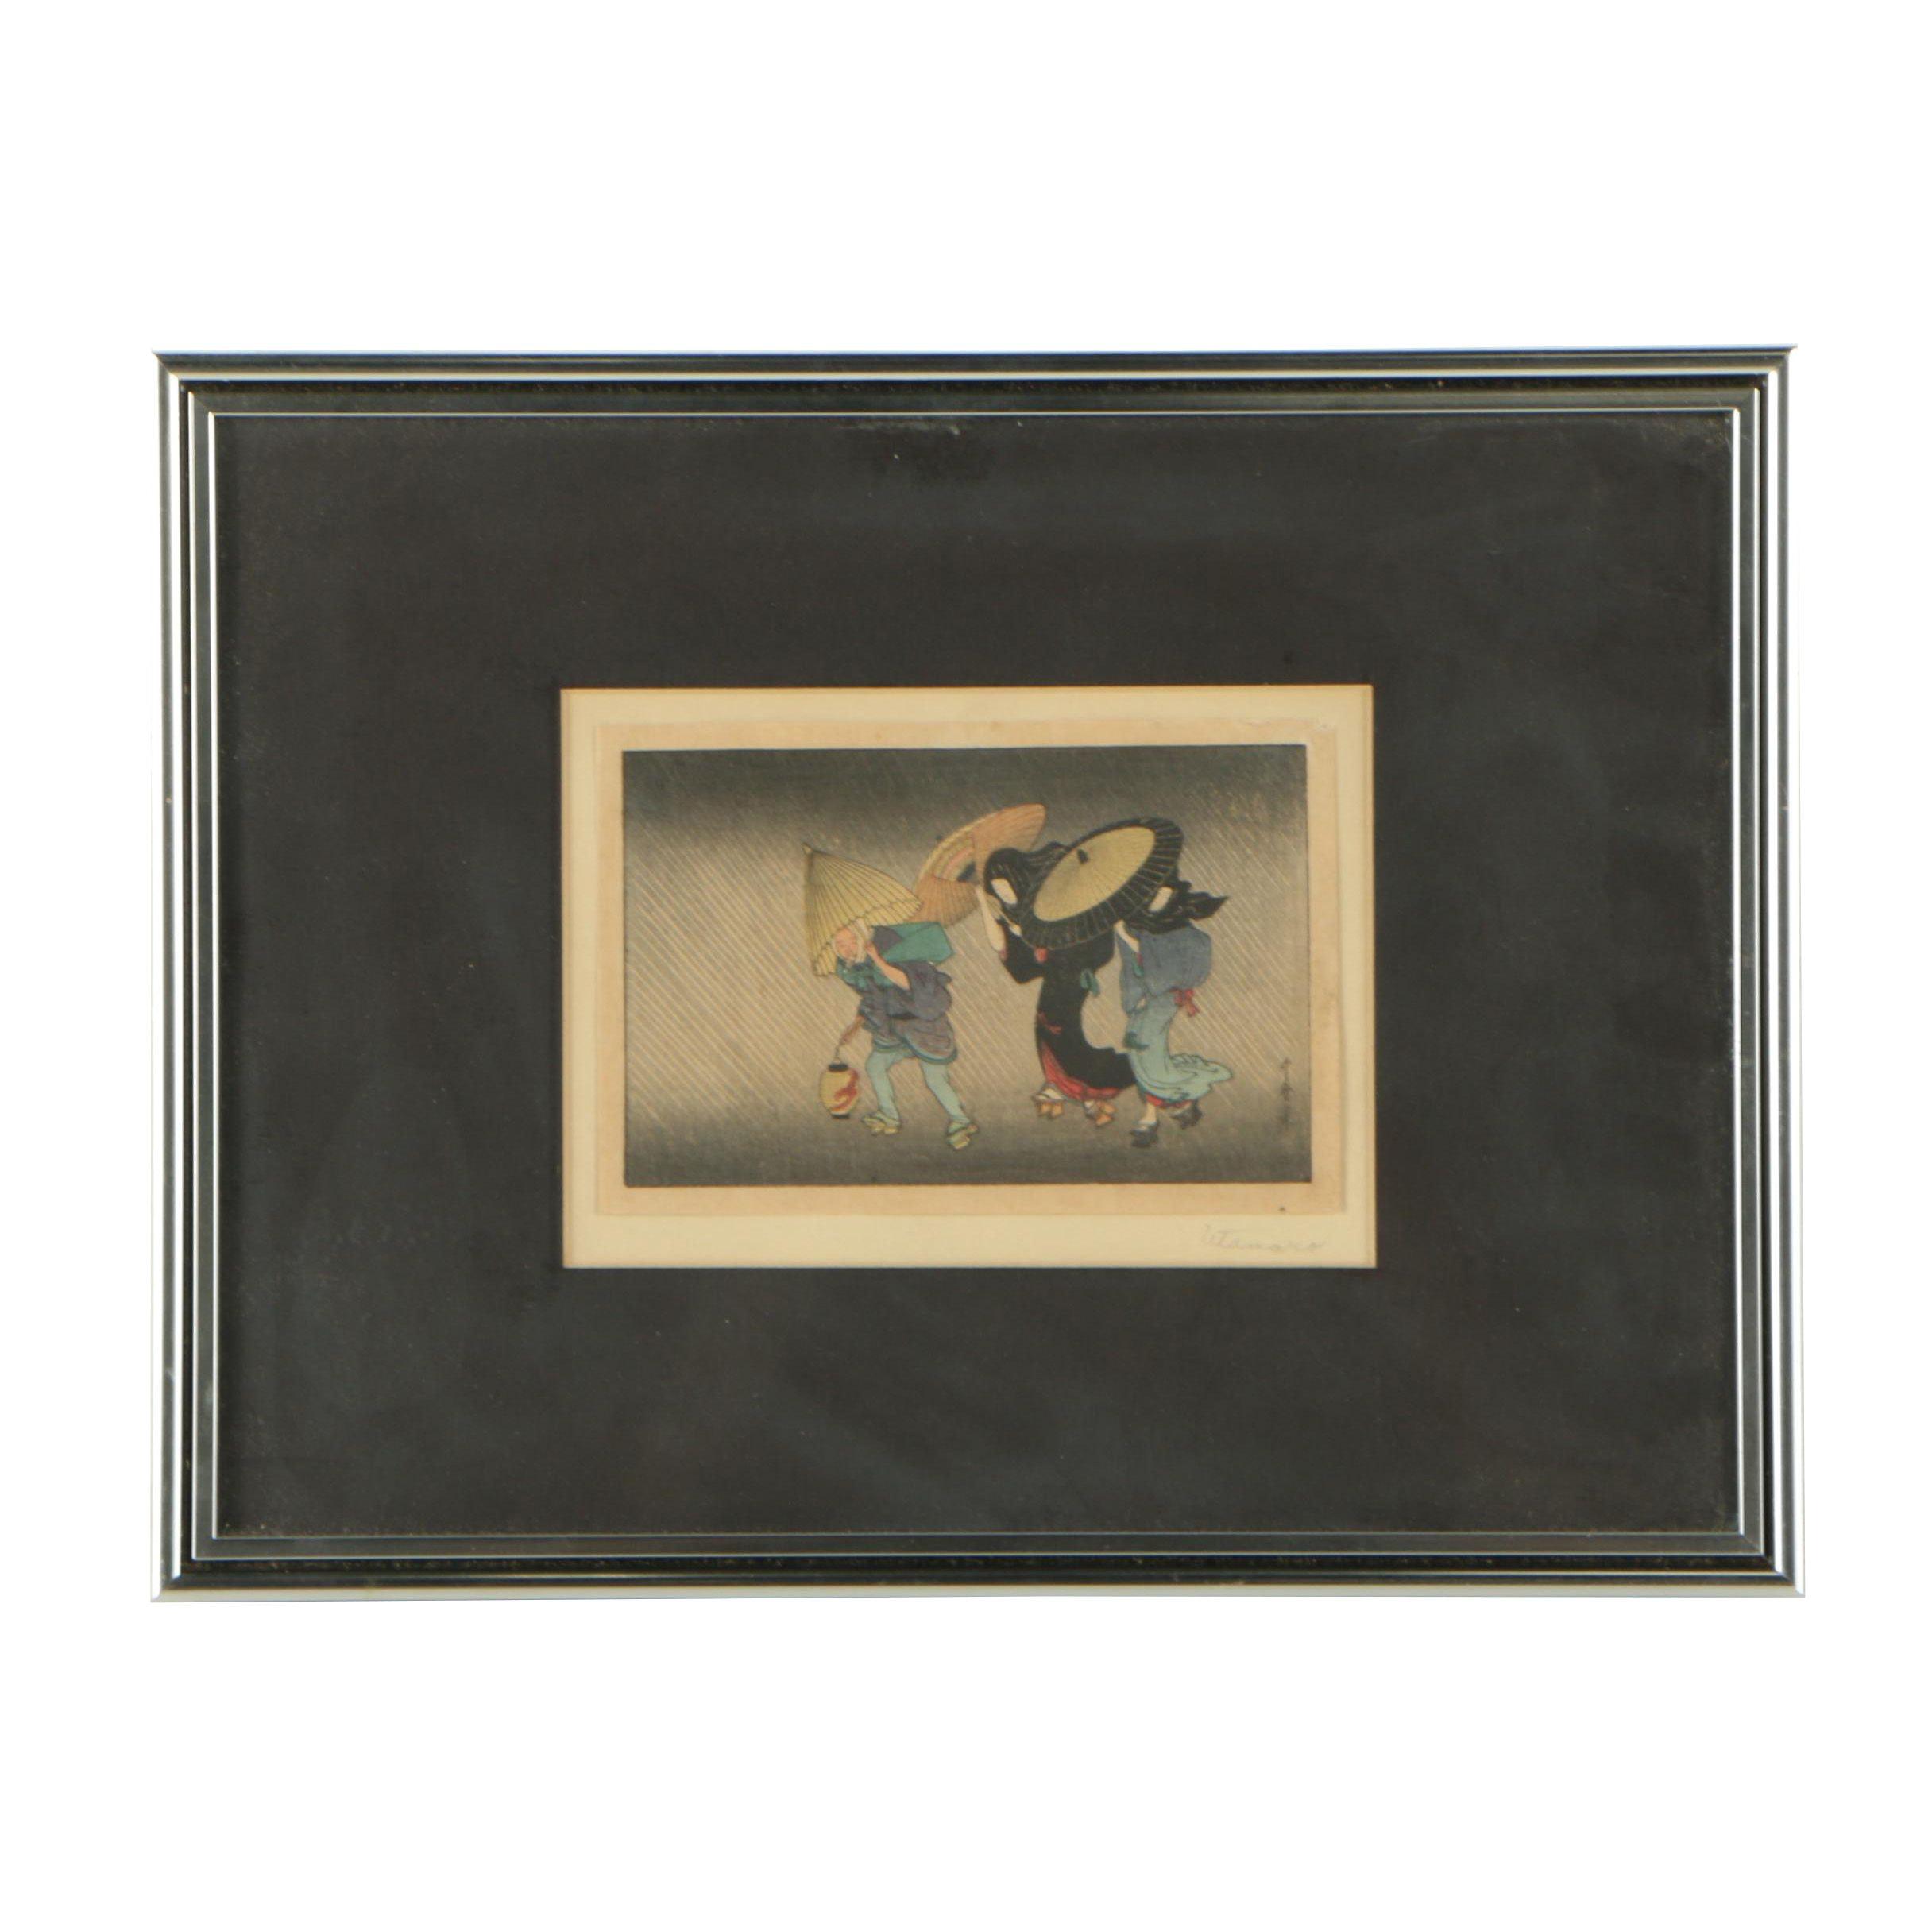 "Woodblock Print After Kitagawa Utamaro ""In the Storm"""